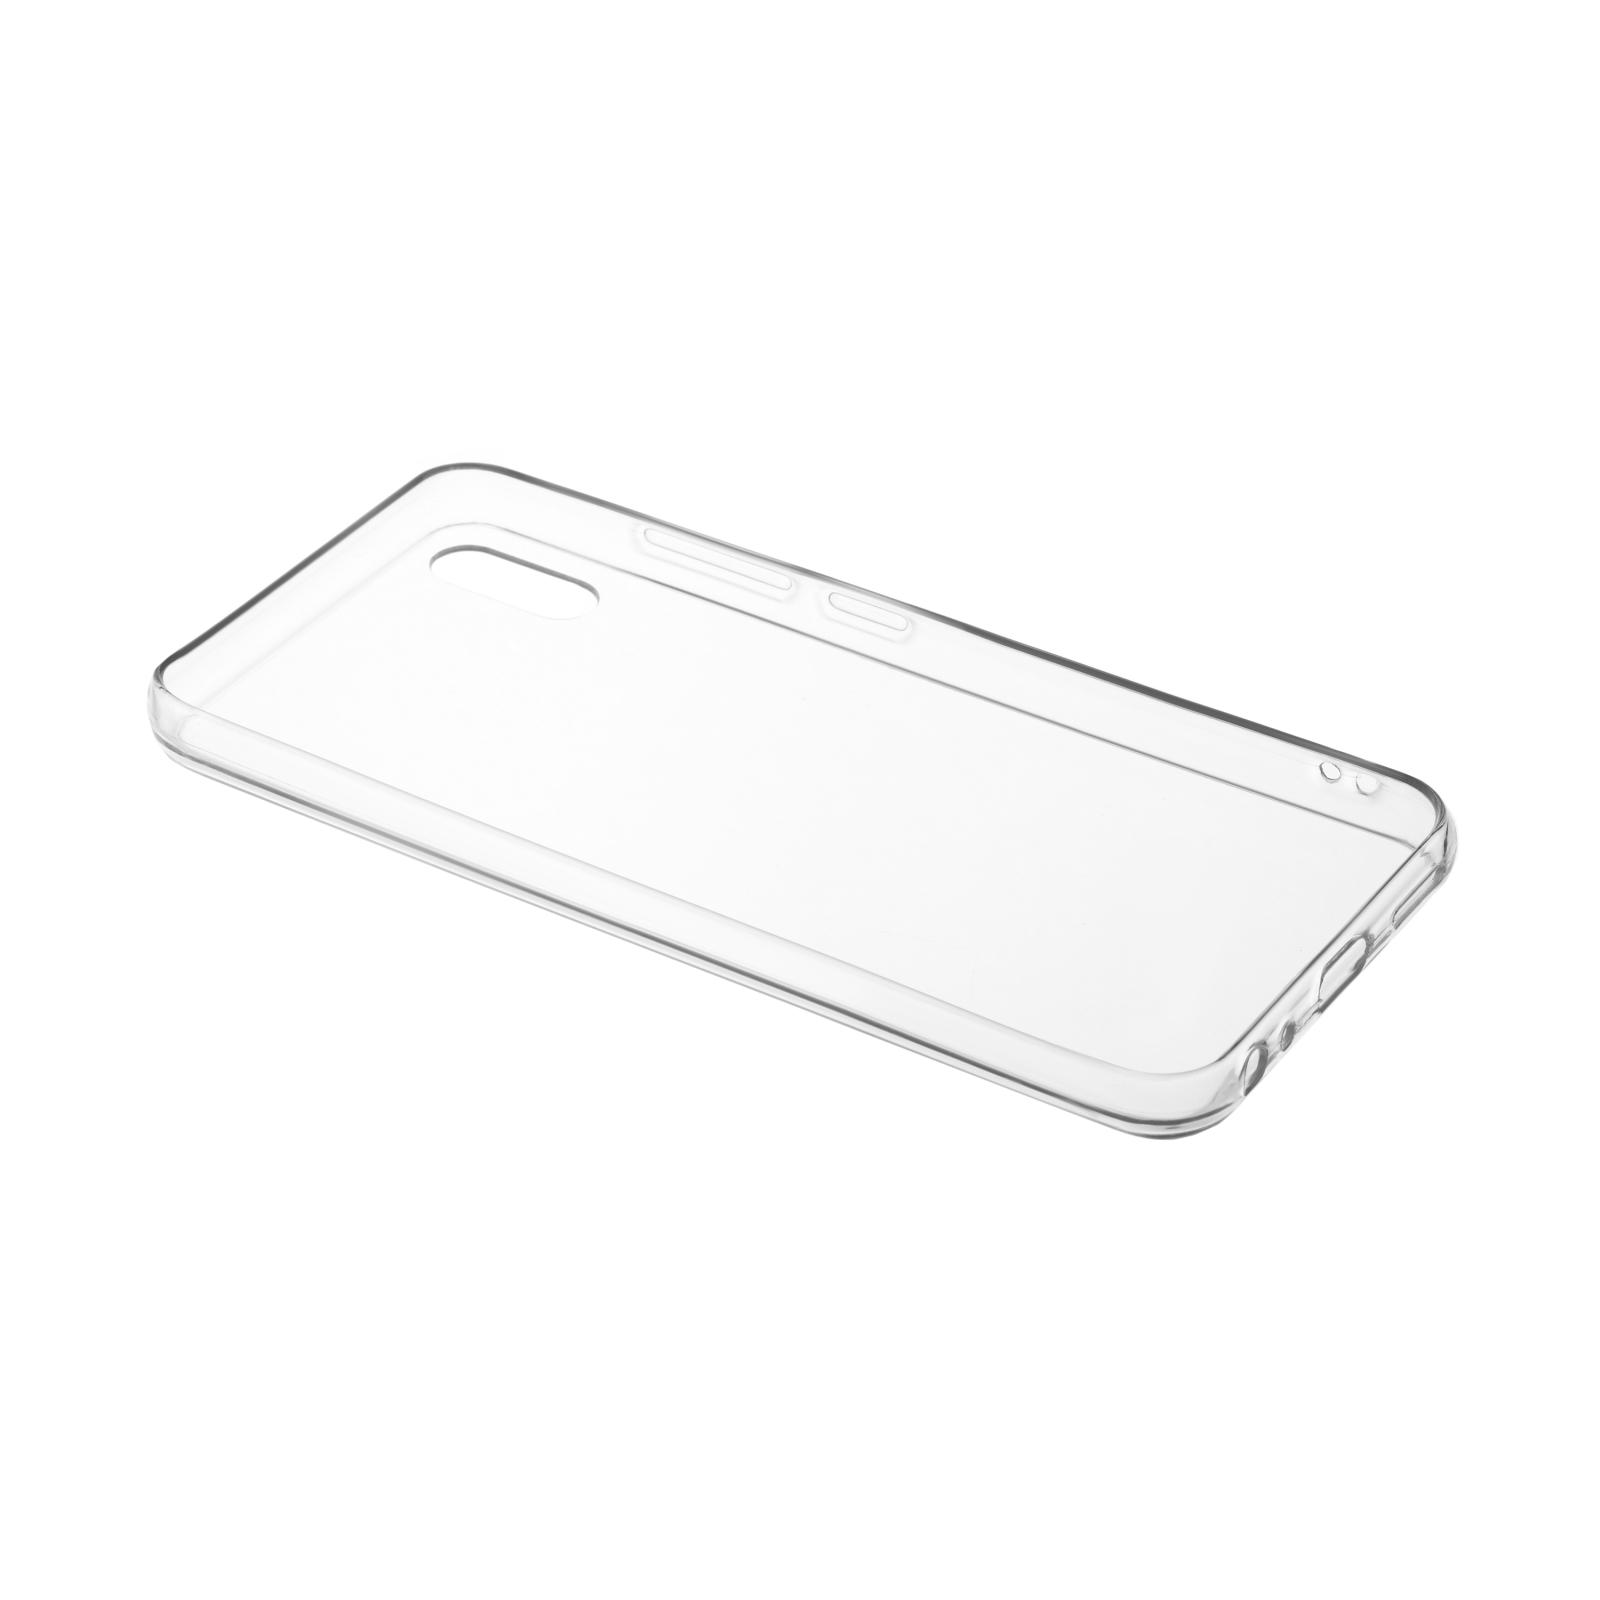 Чехол для моб. телефона 2E VIVO Y91C, Hybrid, Transparent (2E-V-Y91C-AOHB-TR) изображение 2